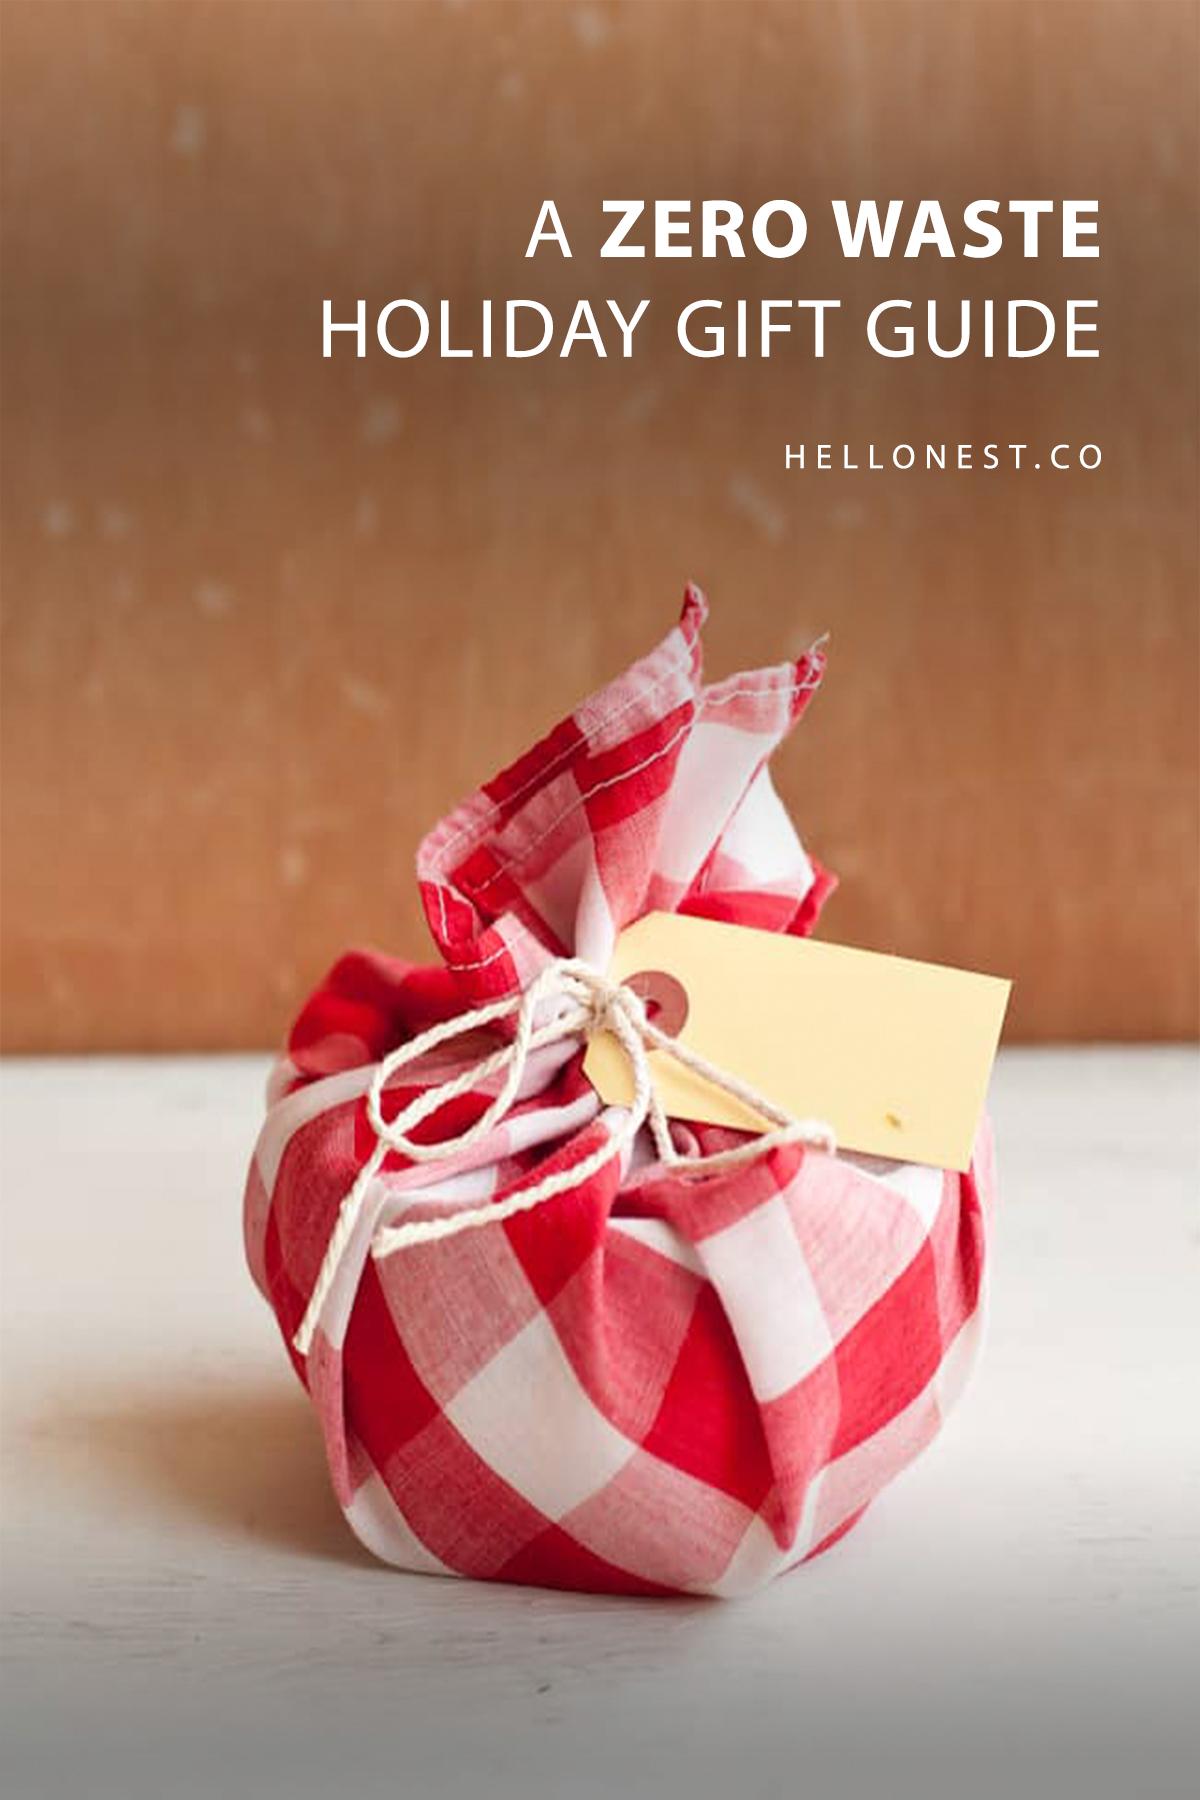 Zero Waste Gift Guide